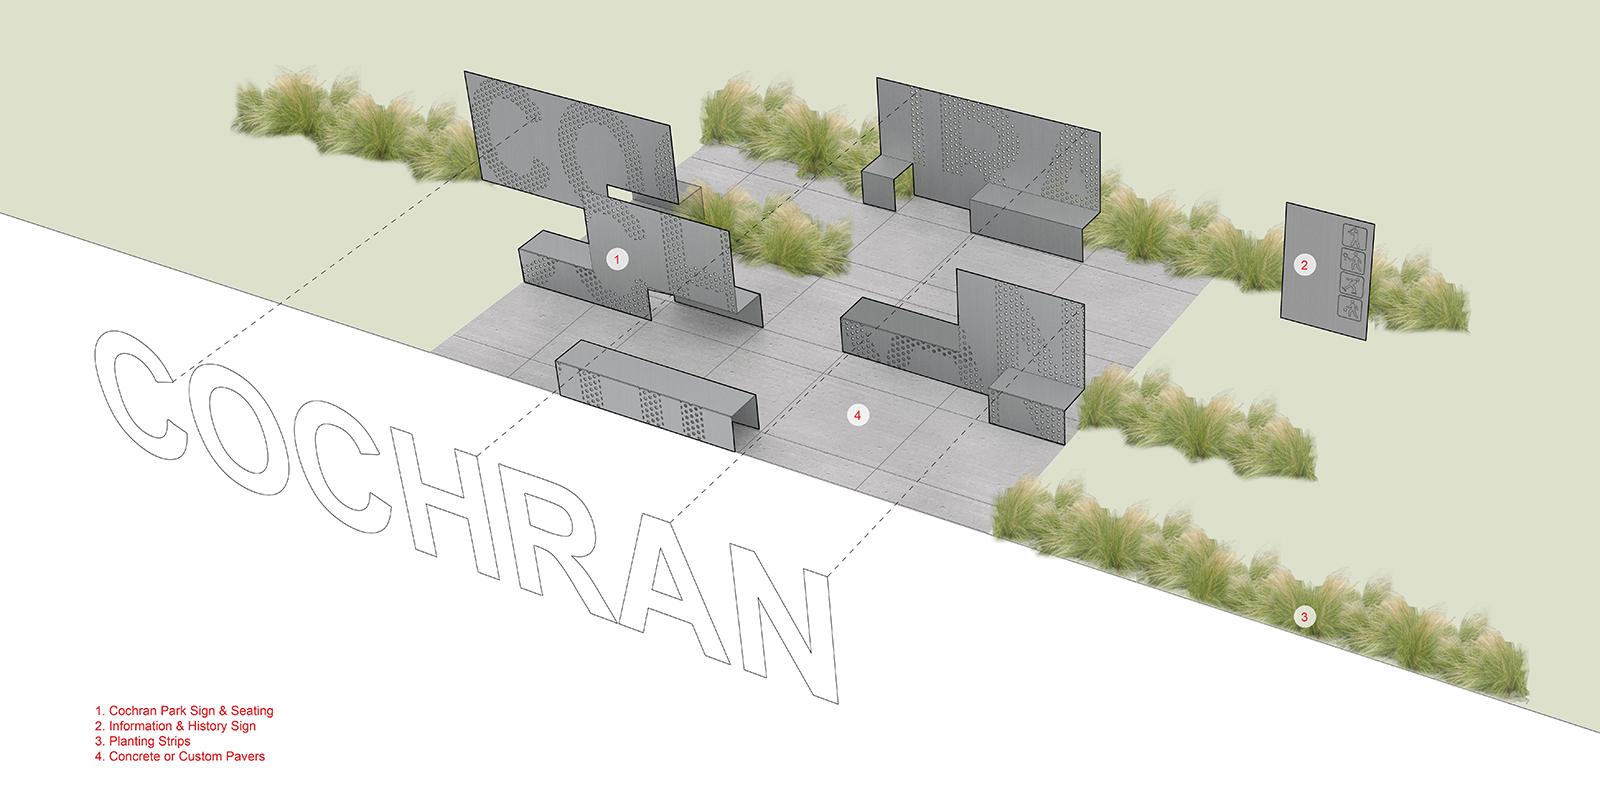 MinDay_Cochran Park_hisheji_02